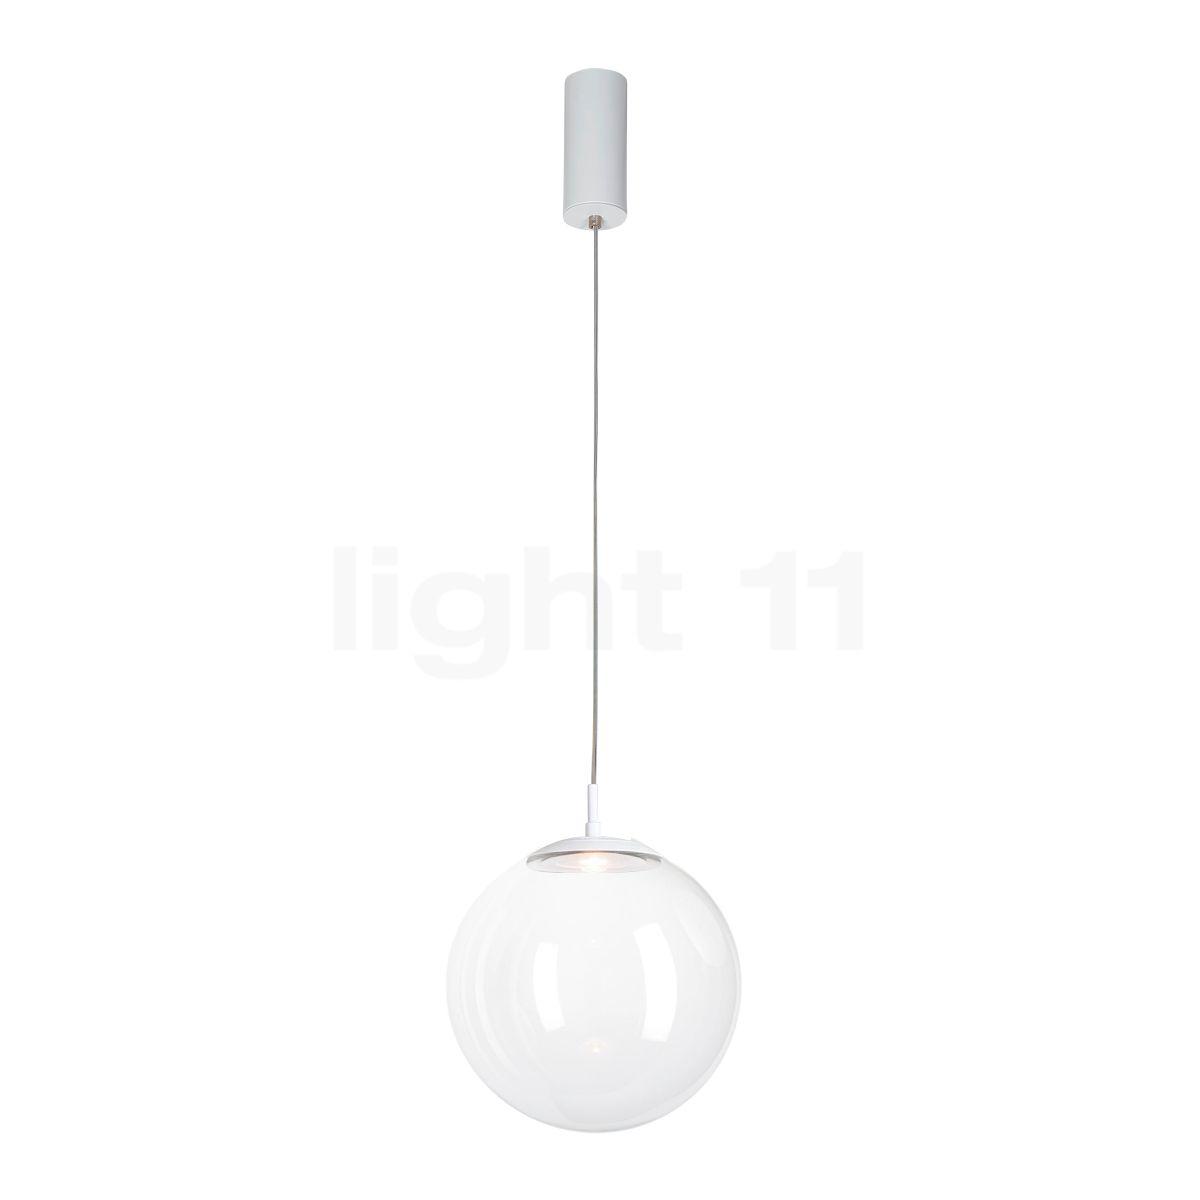 Mawa Glaskugelleuchte LED, Kristallglas/weiß matt ku3-7-3000-gc-9016